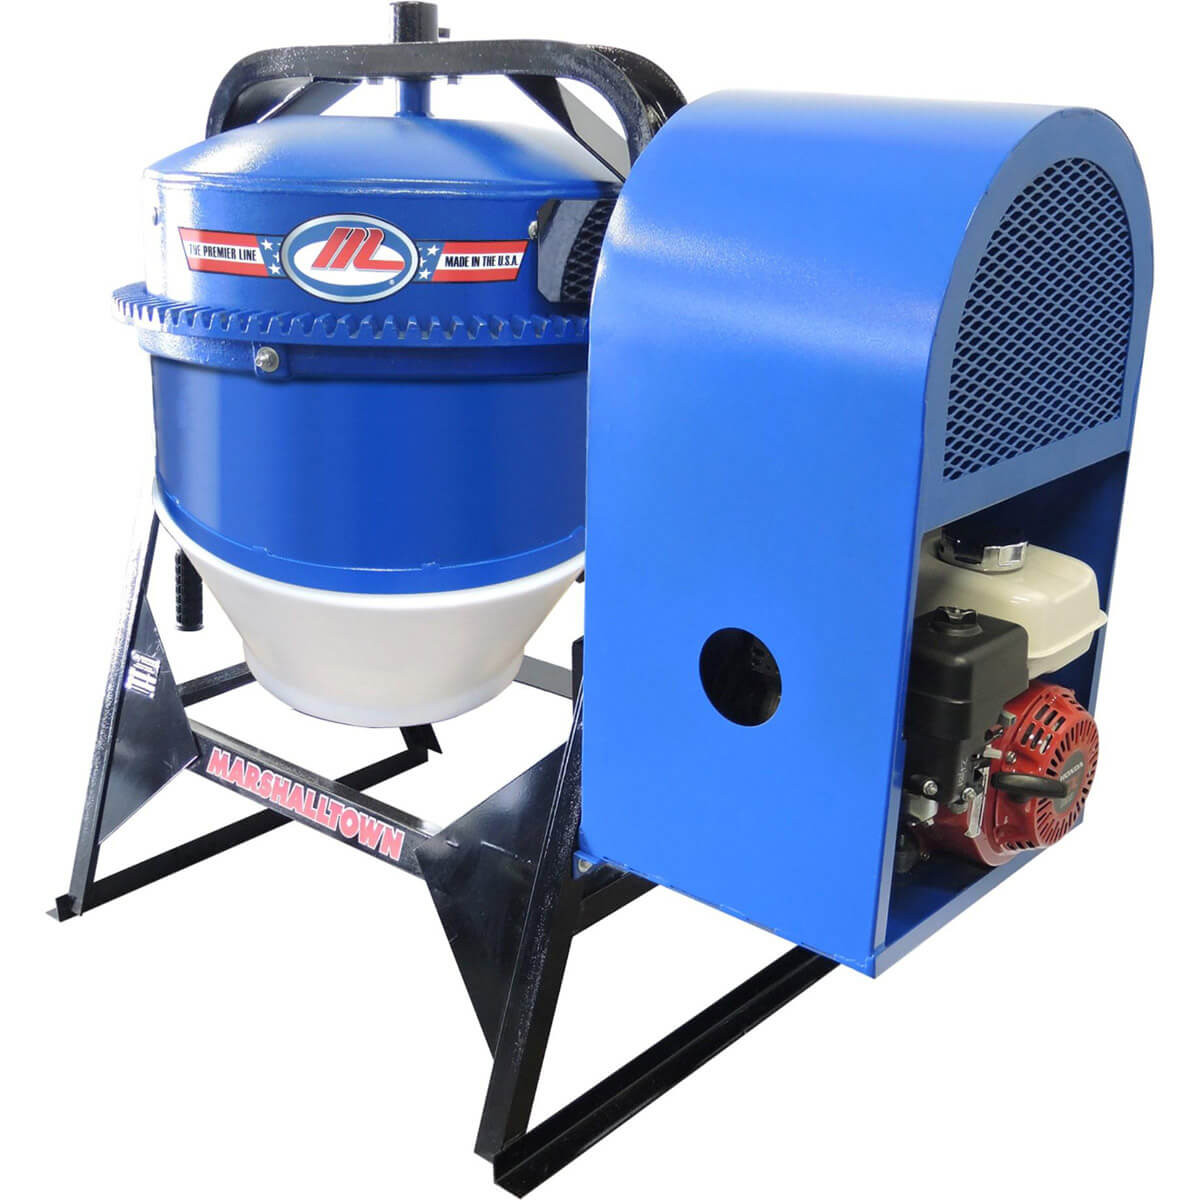 Cleform Gilson 300UT-PL mixer